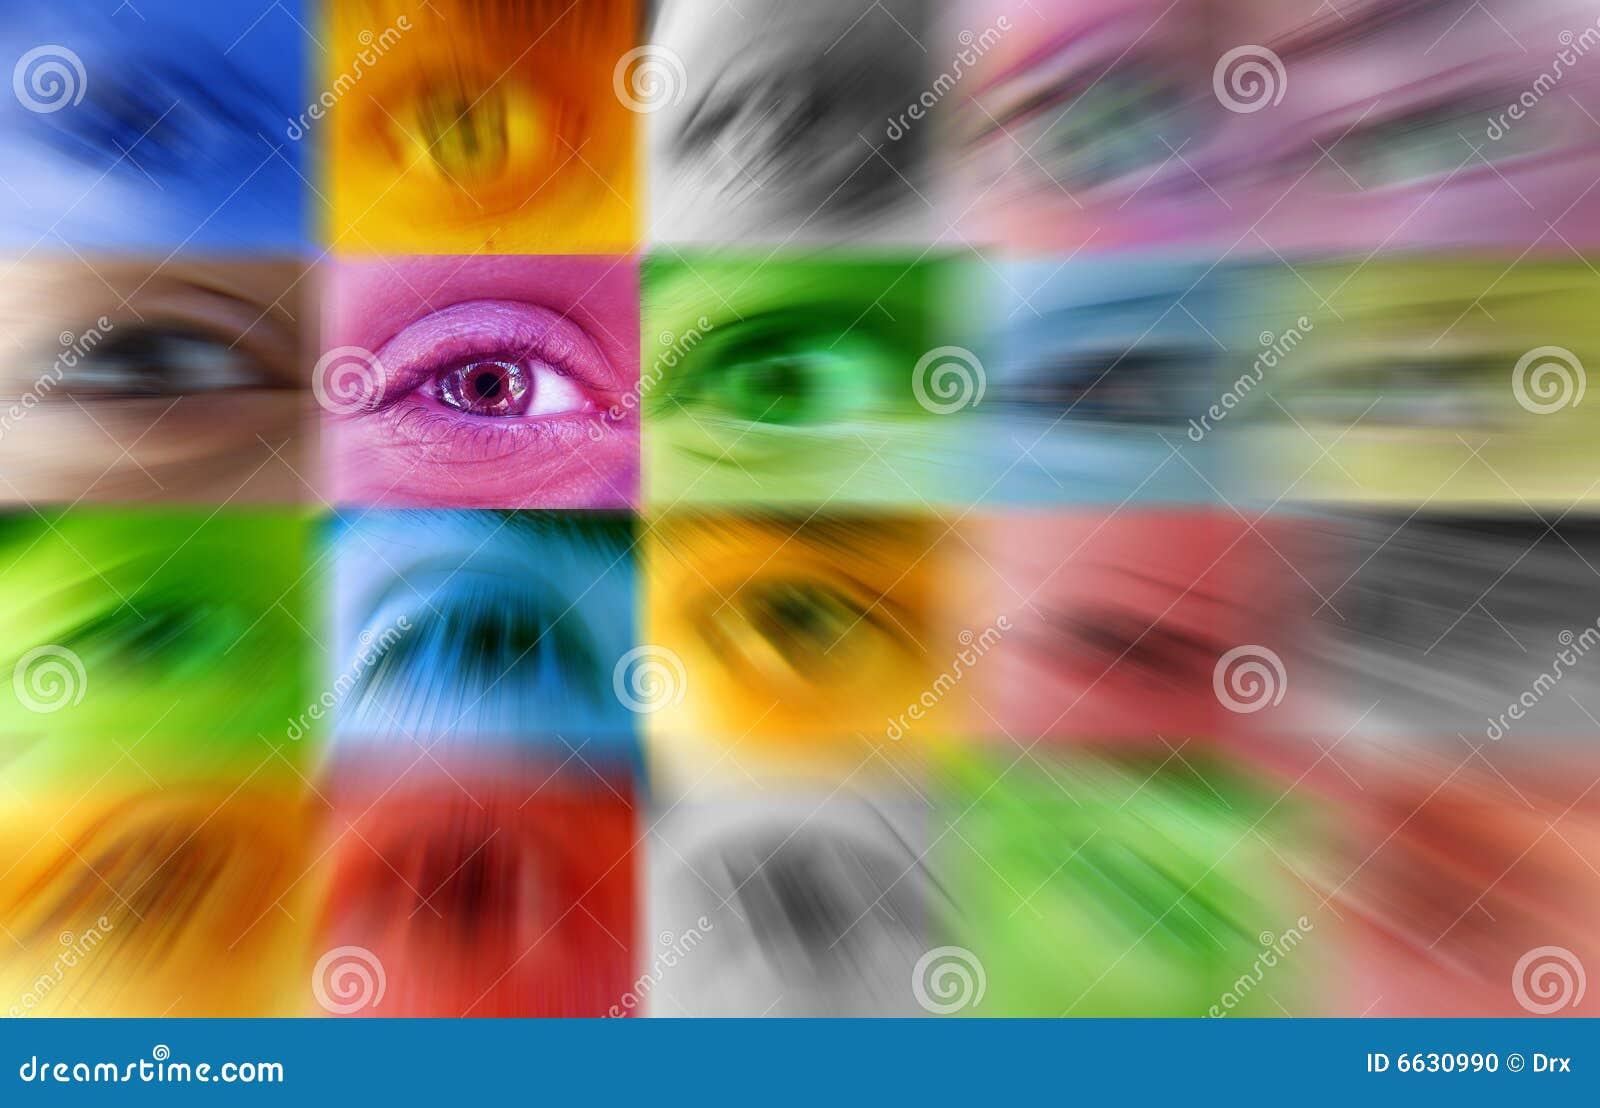 Individual - human eye